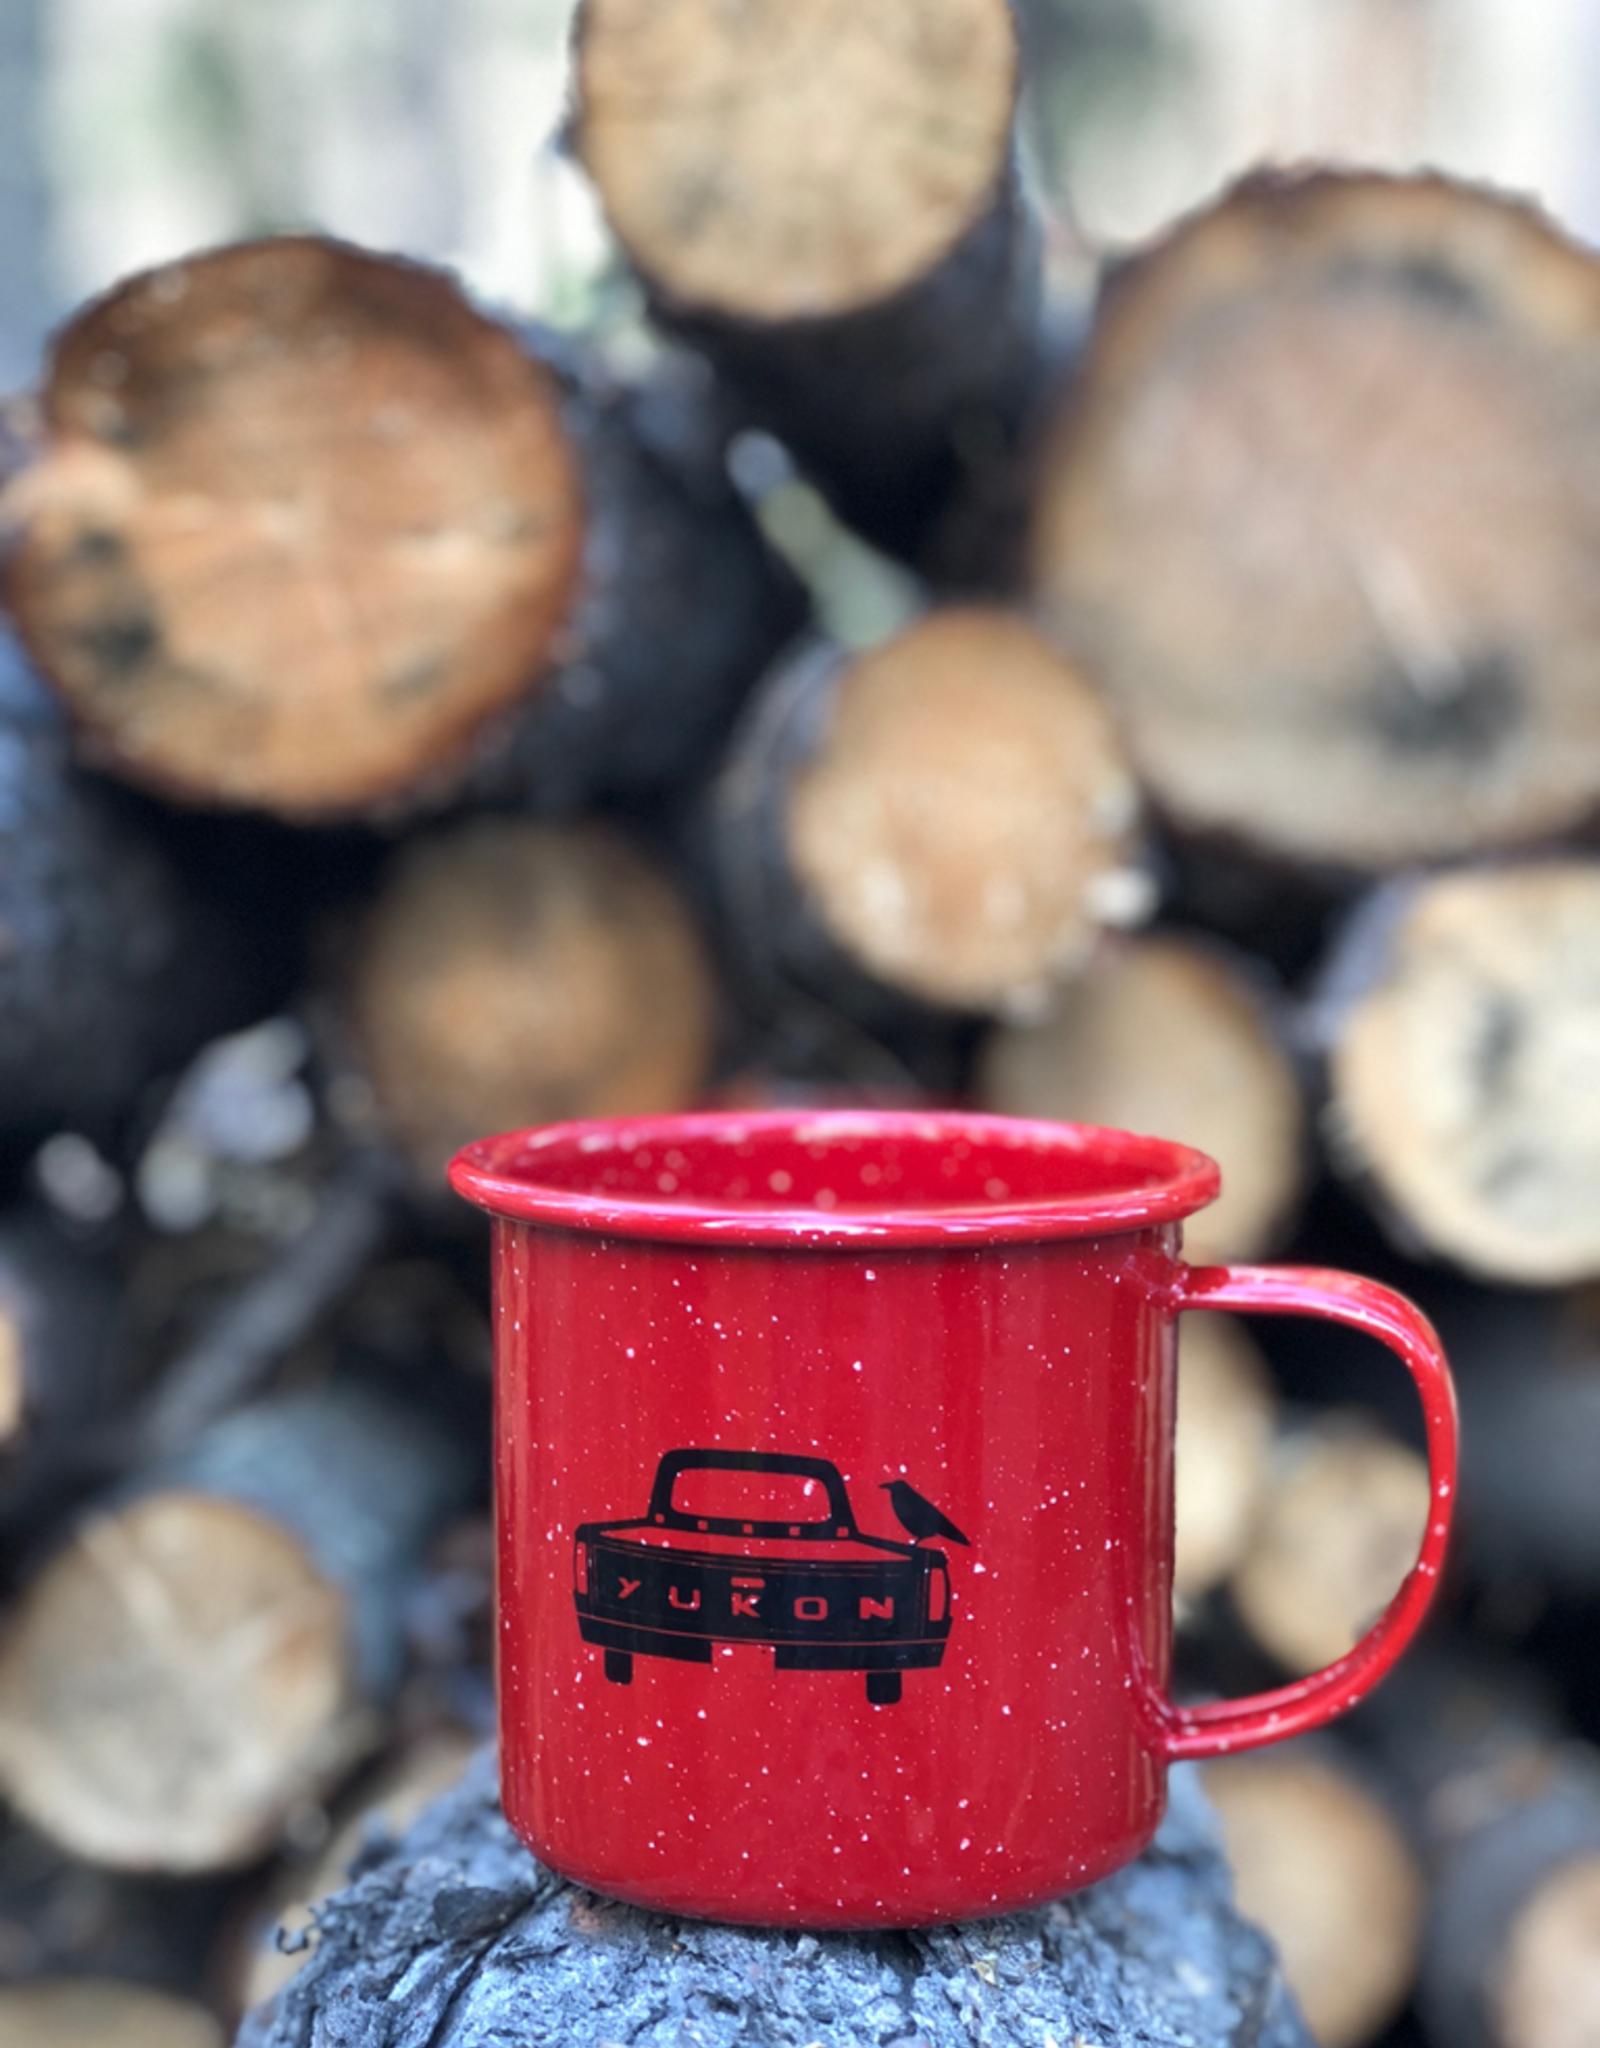 The Collective Good The Collective Good Enamel Mug-Yukon Truck